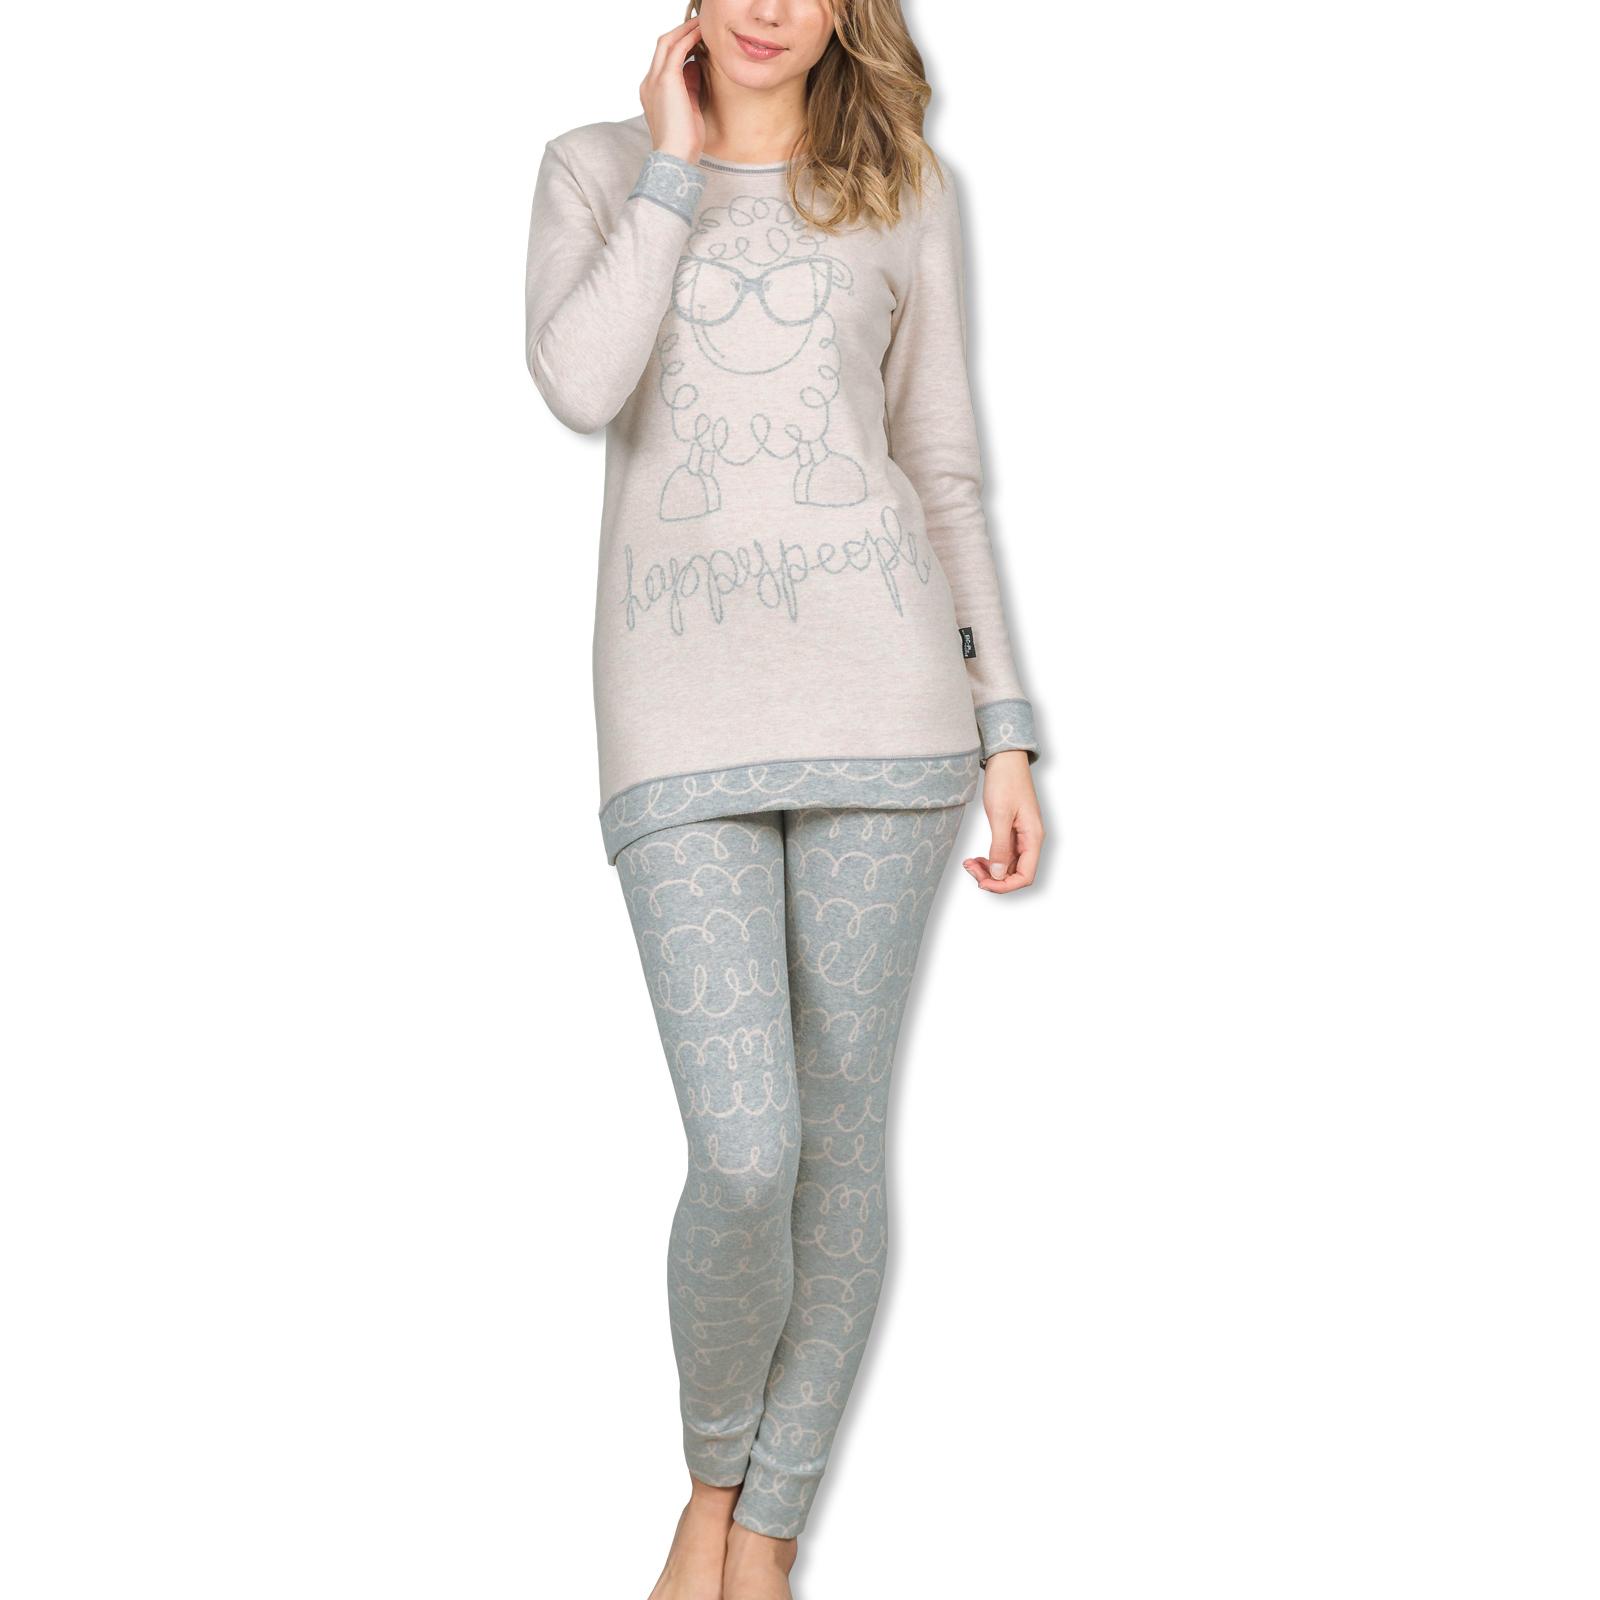 Happy People Damen Pyjama Set M L XL 3901 in altrosa / grau